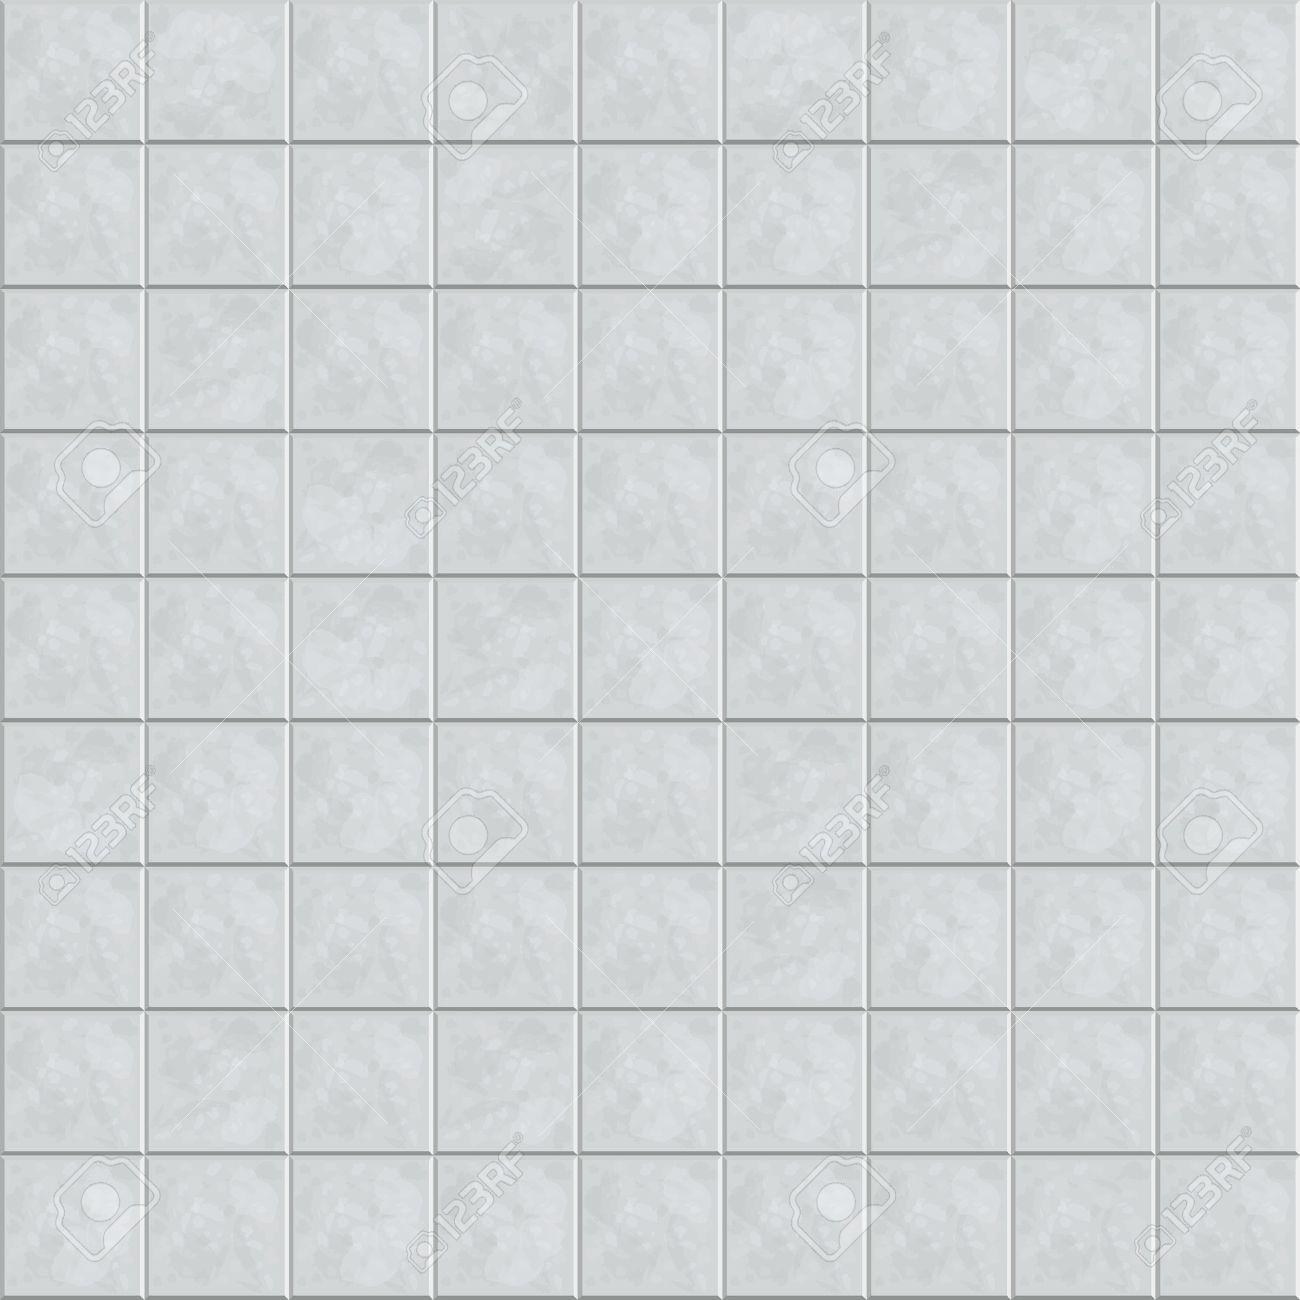 ceramic tile floor seamless pattern vector illustration